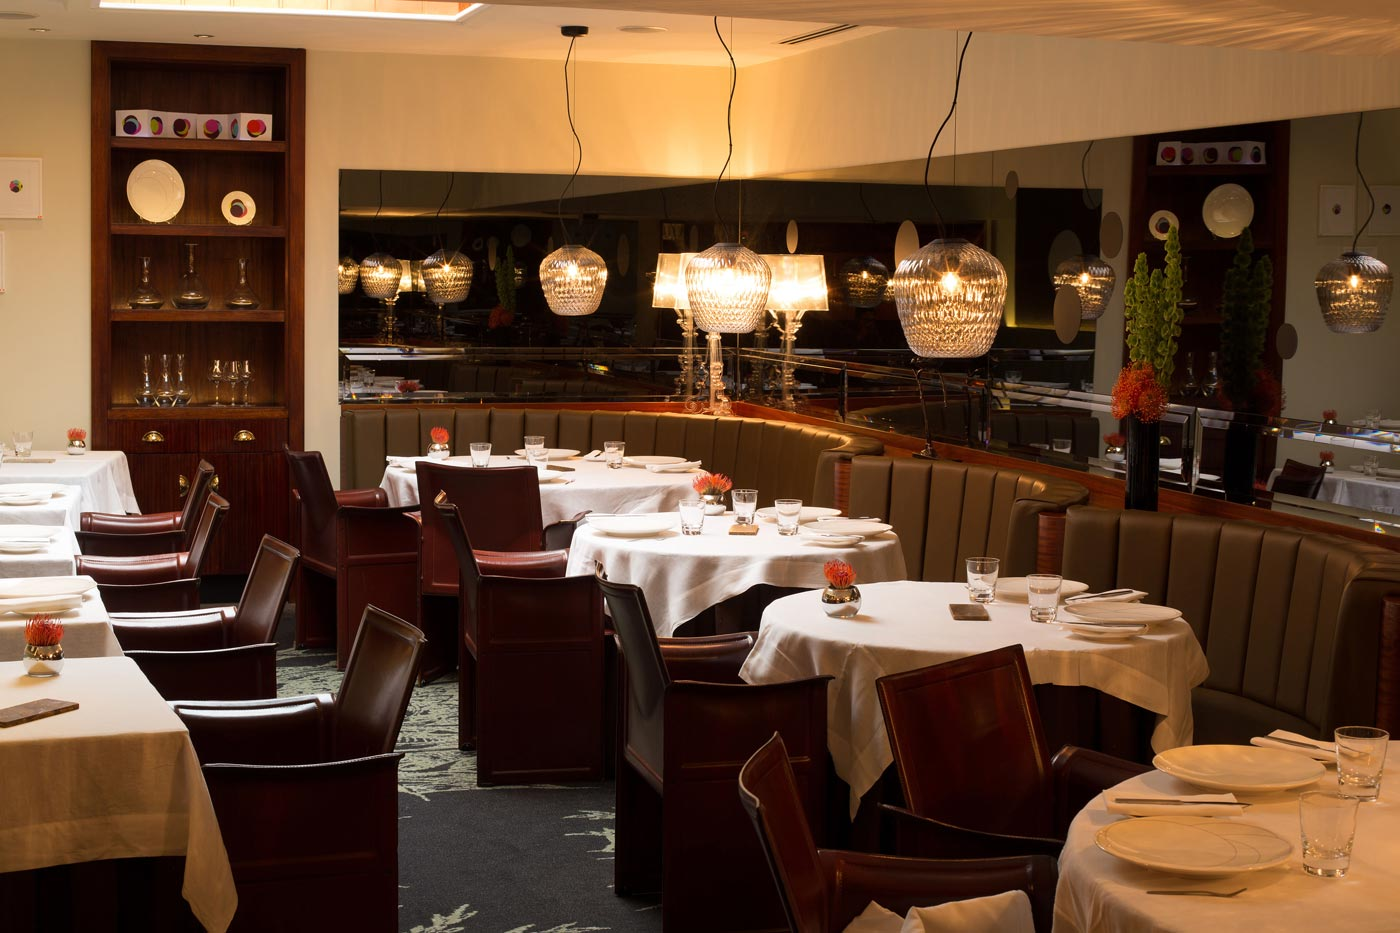 Leanne Kelsall Picks Five Must-Visit London Restaurants In 2018 6